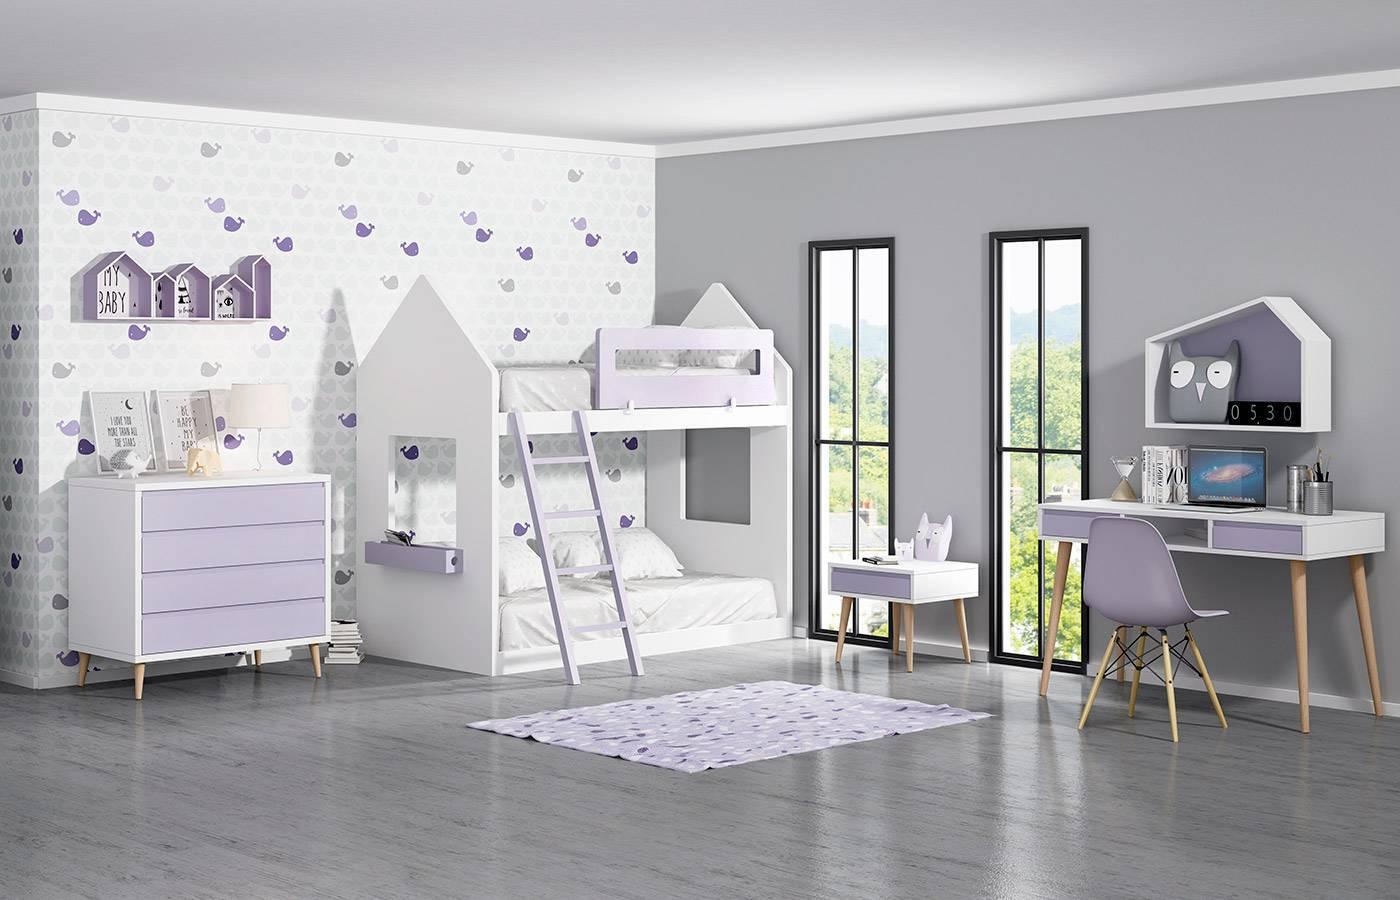 Habitaci n infantil con litera kids 05 dismobel - Habitacion con litera ...